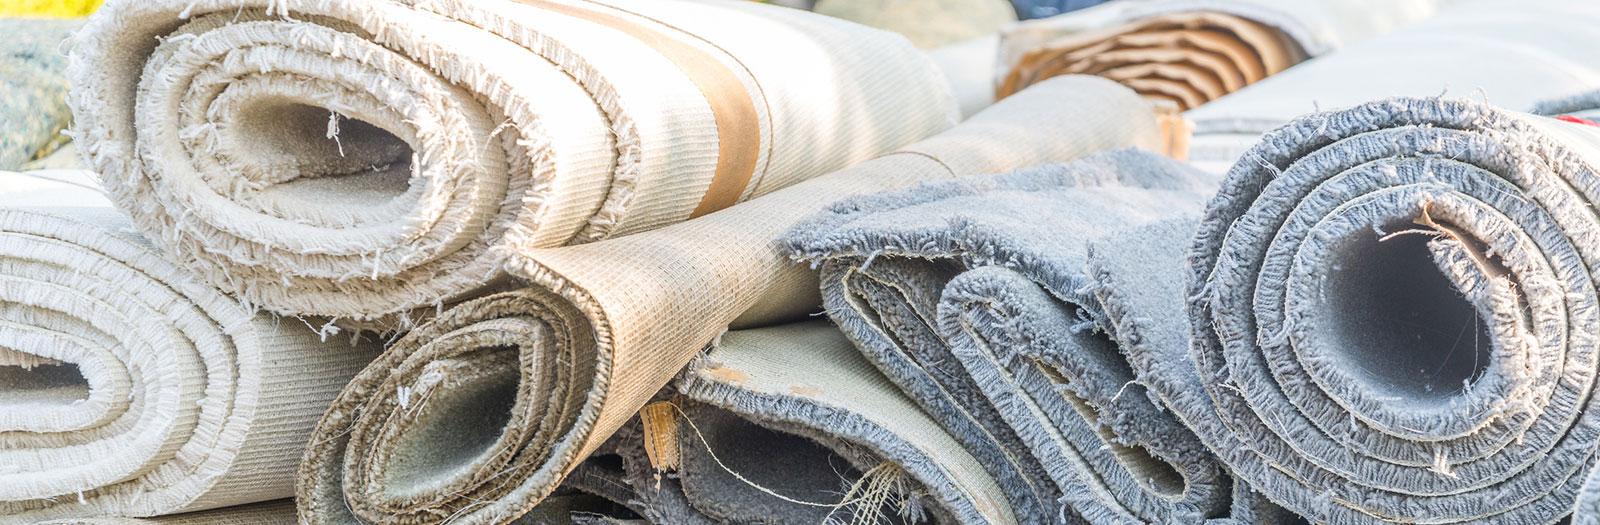 rolls of carpet remnants